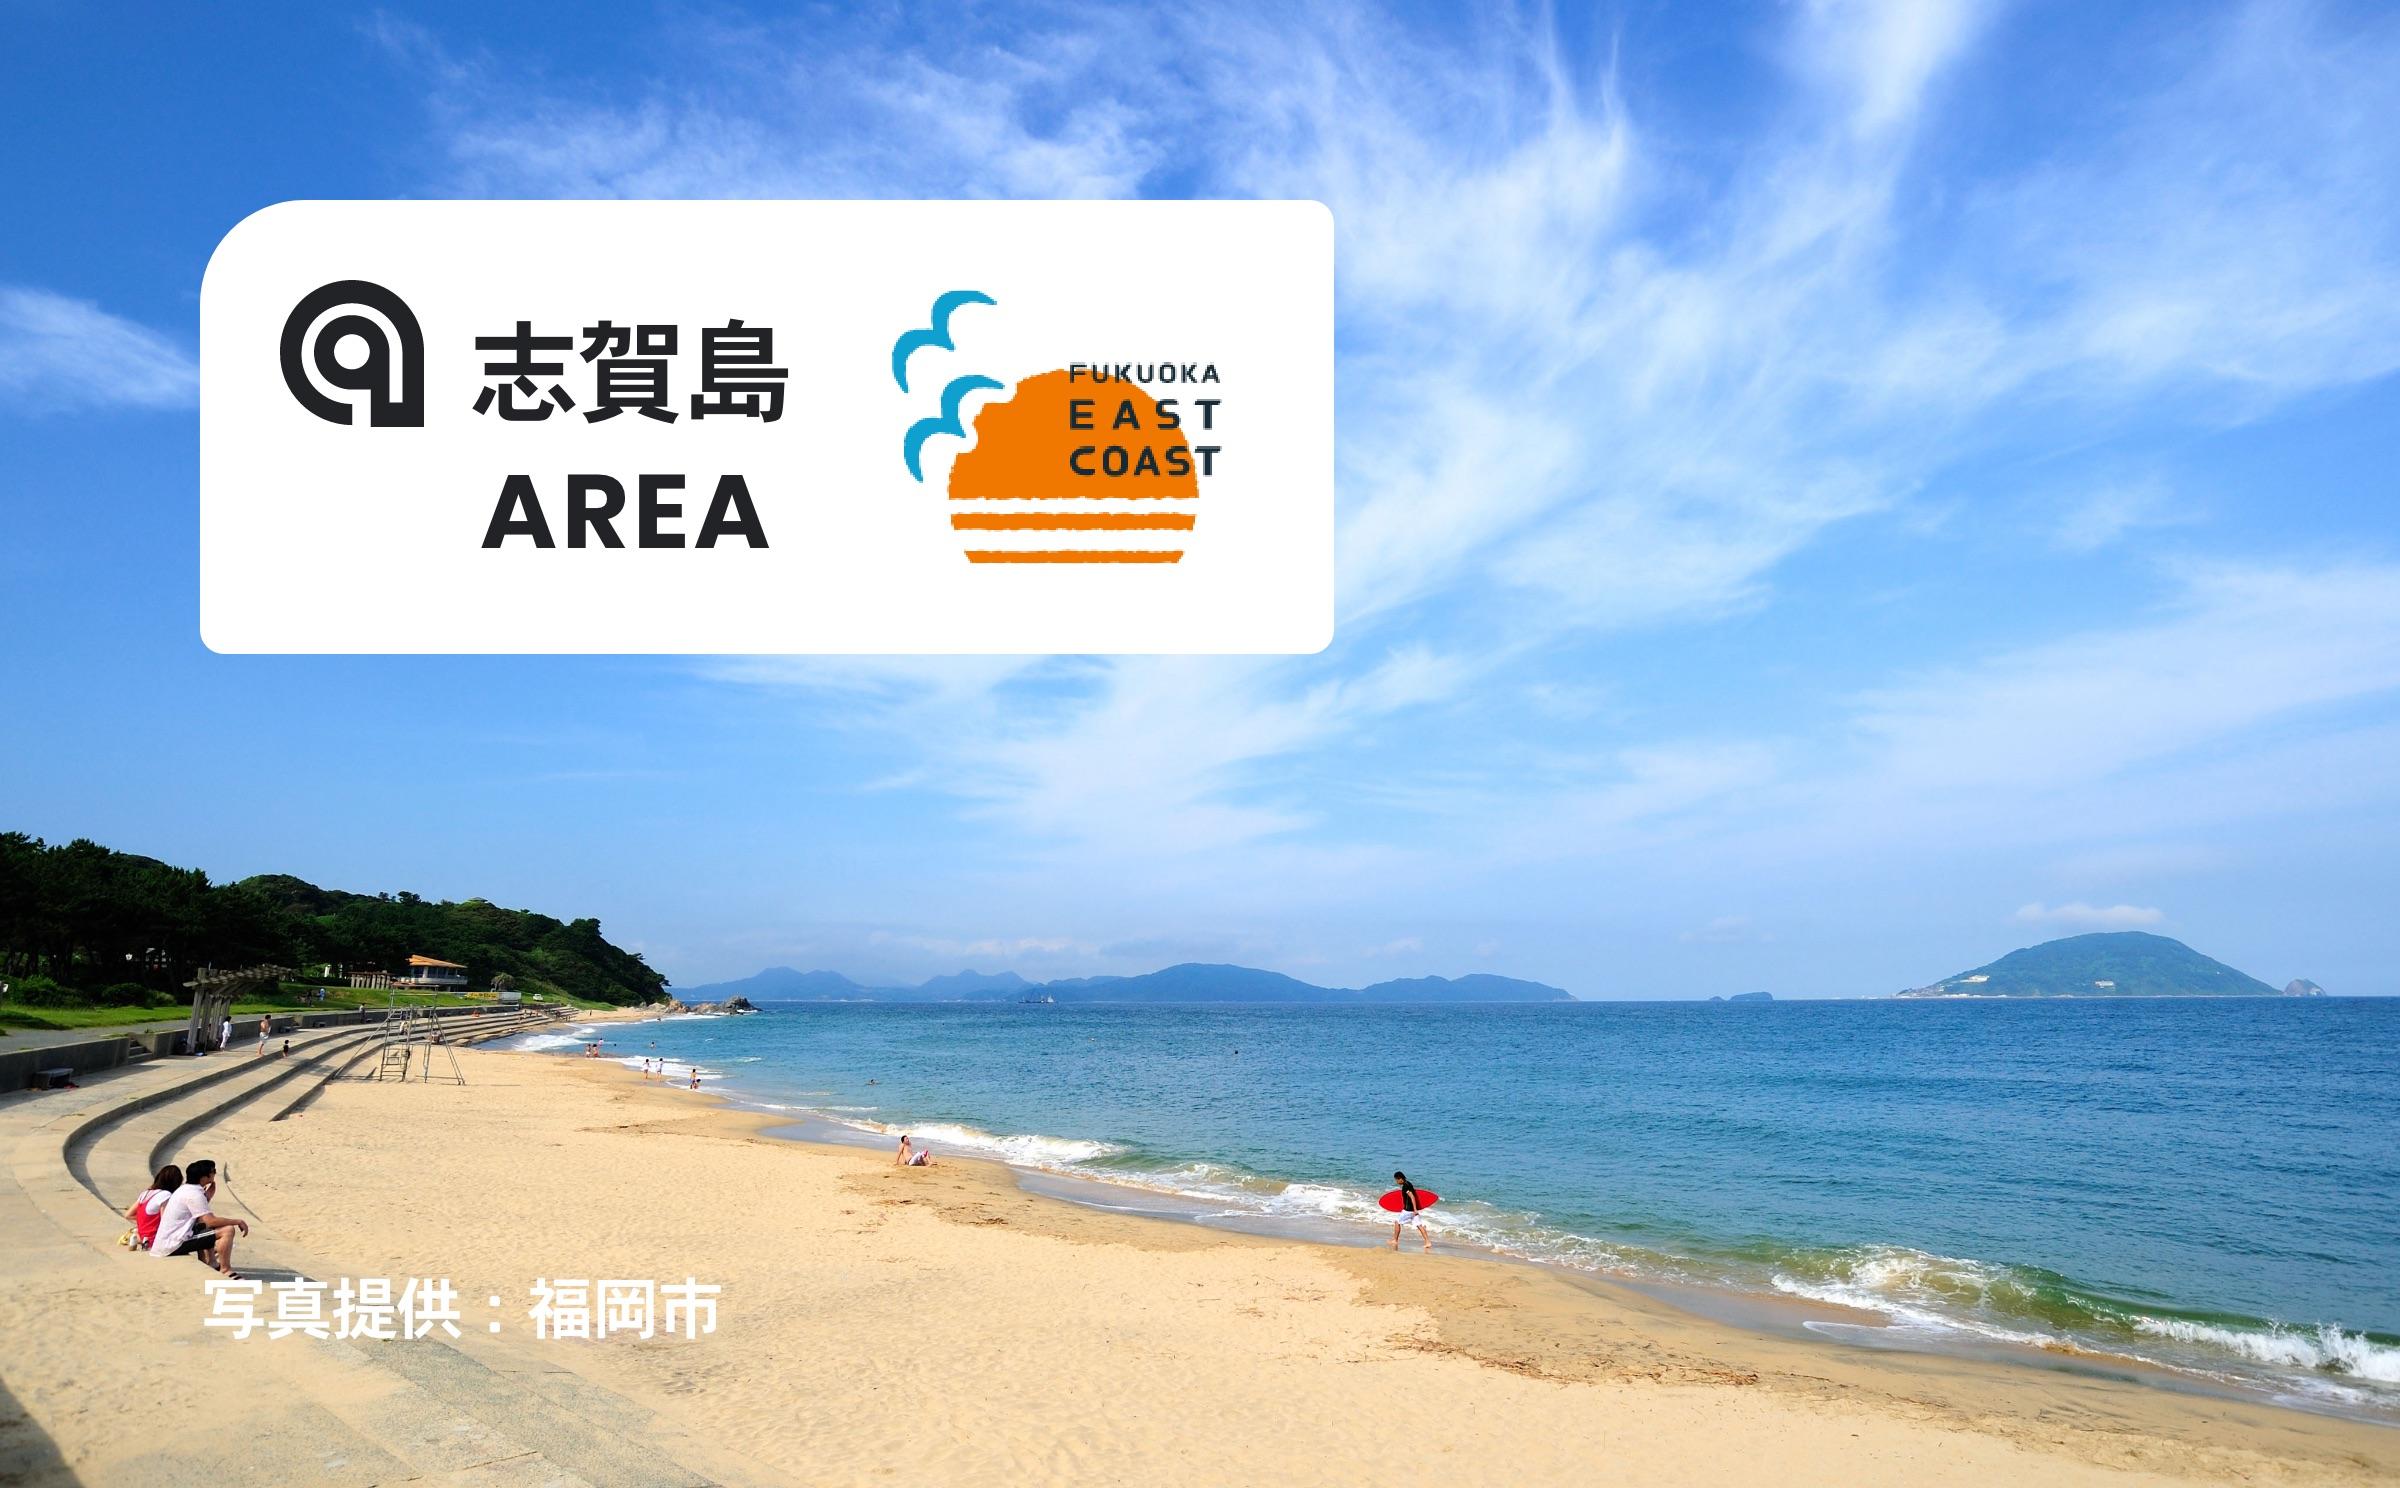 FUKUOKA EAST COAST – 志賀島エリア